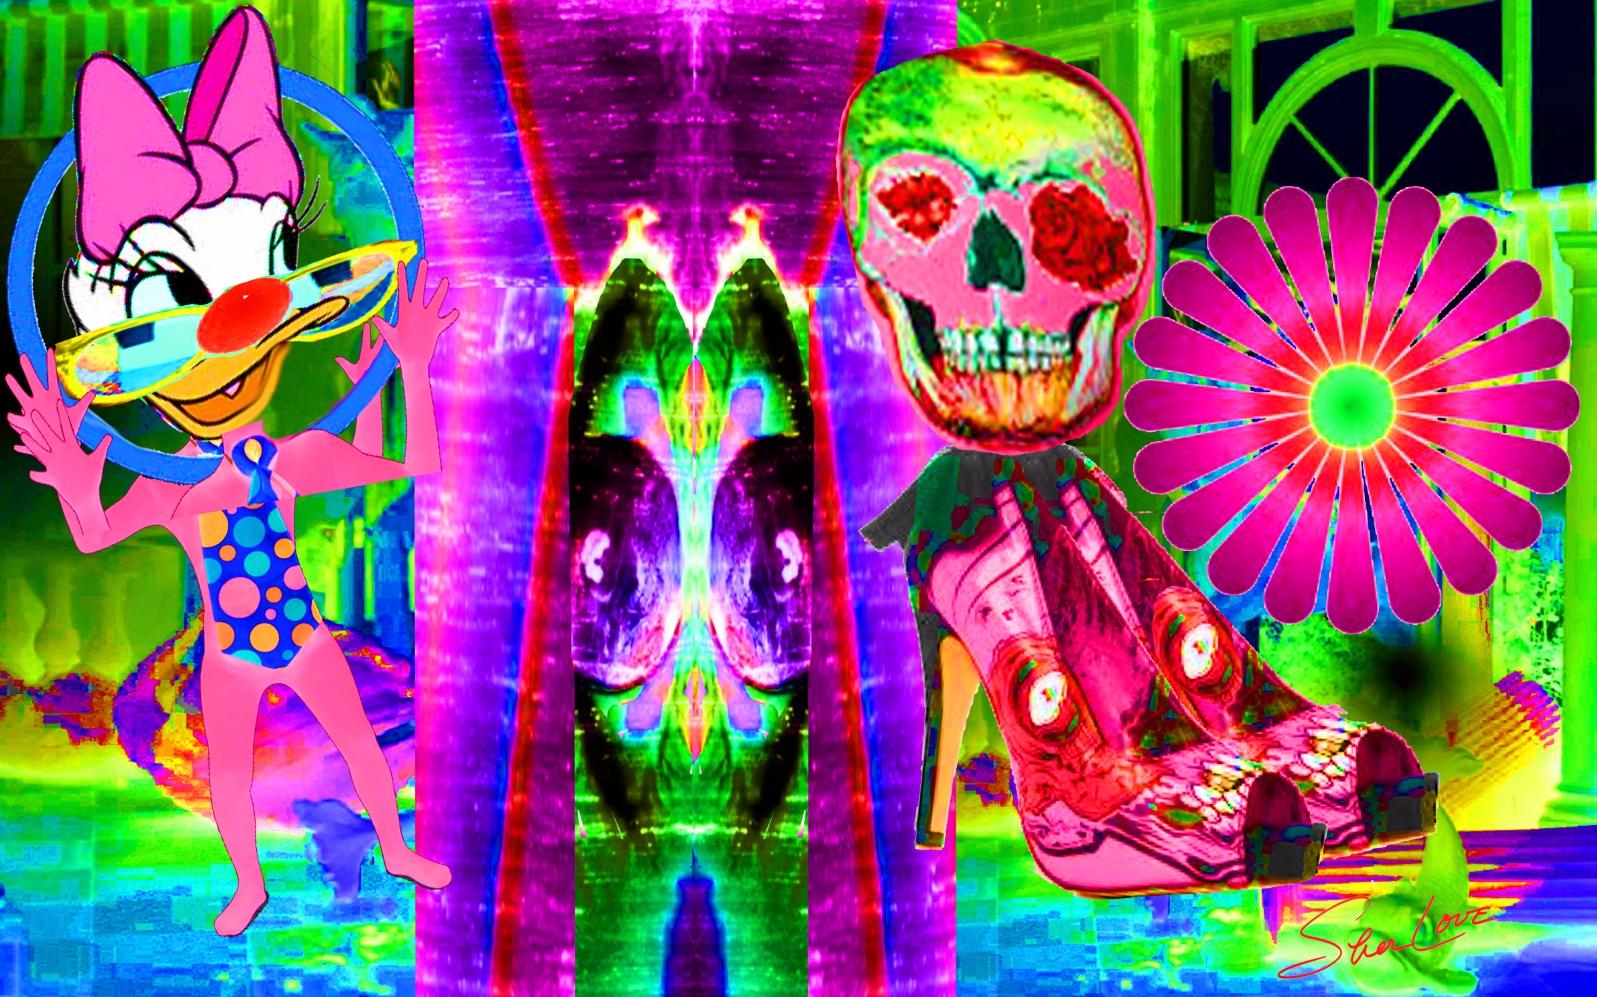 Spooky Toons - Sher Love Collag - sherlove   ello